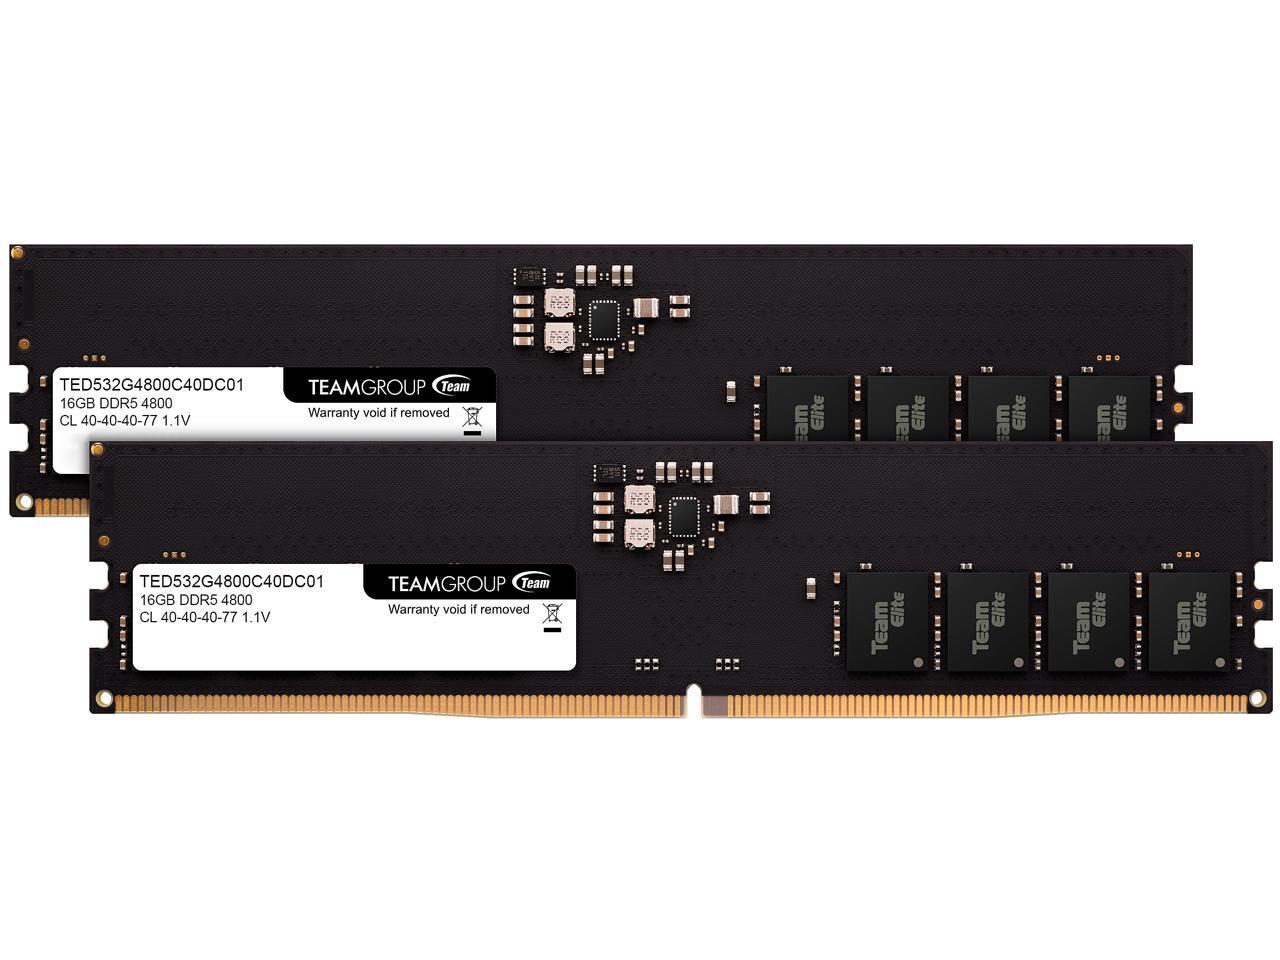 teamgroup-ddr5-4800-32-gb-memory-kit-elite-series-_3